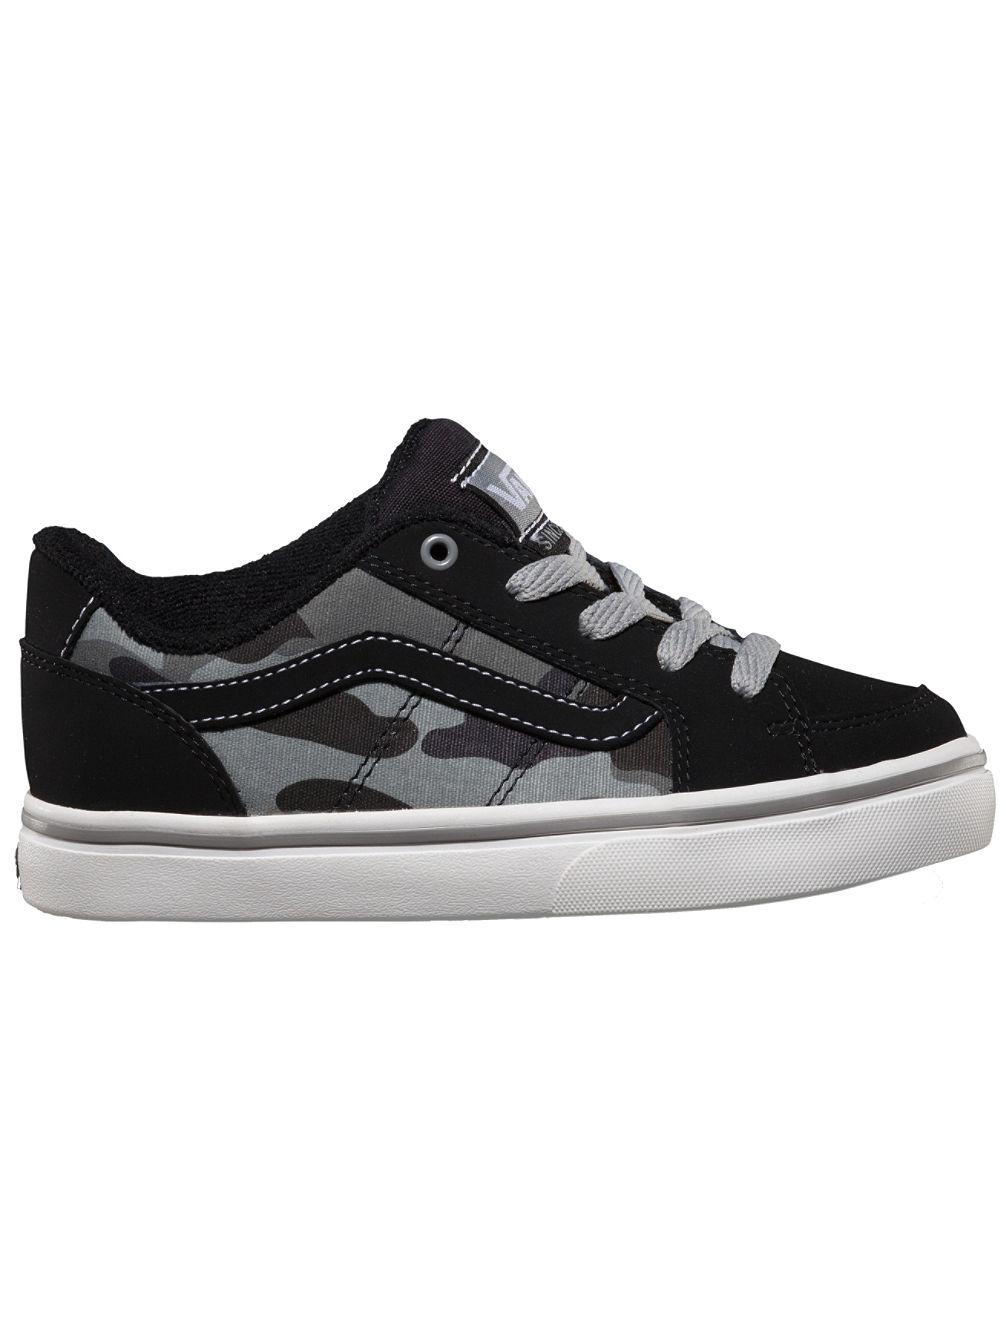 17372bad1e Buy Vans Transistor Sneakers Boys online at Blue Tomato